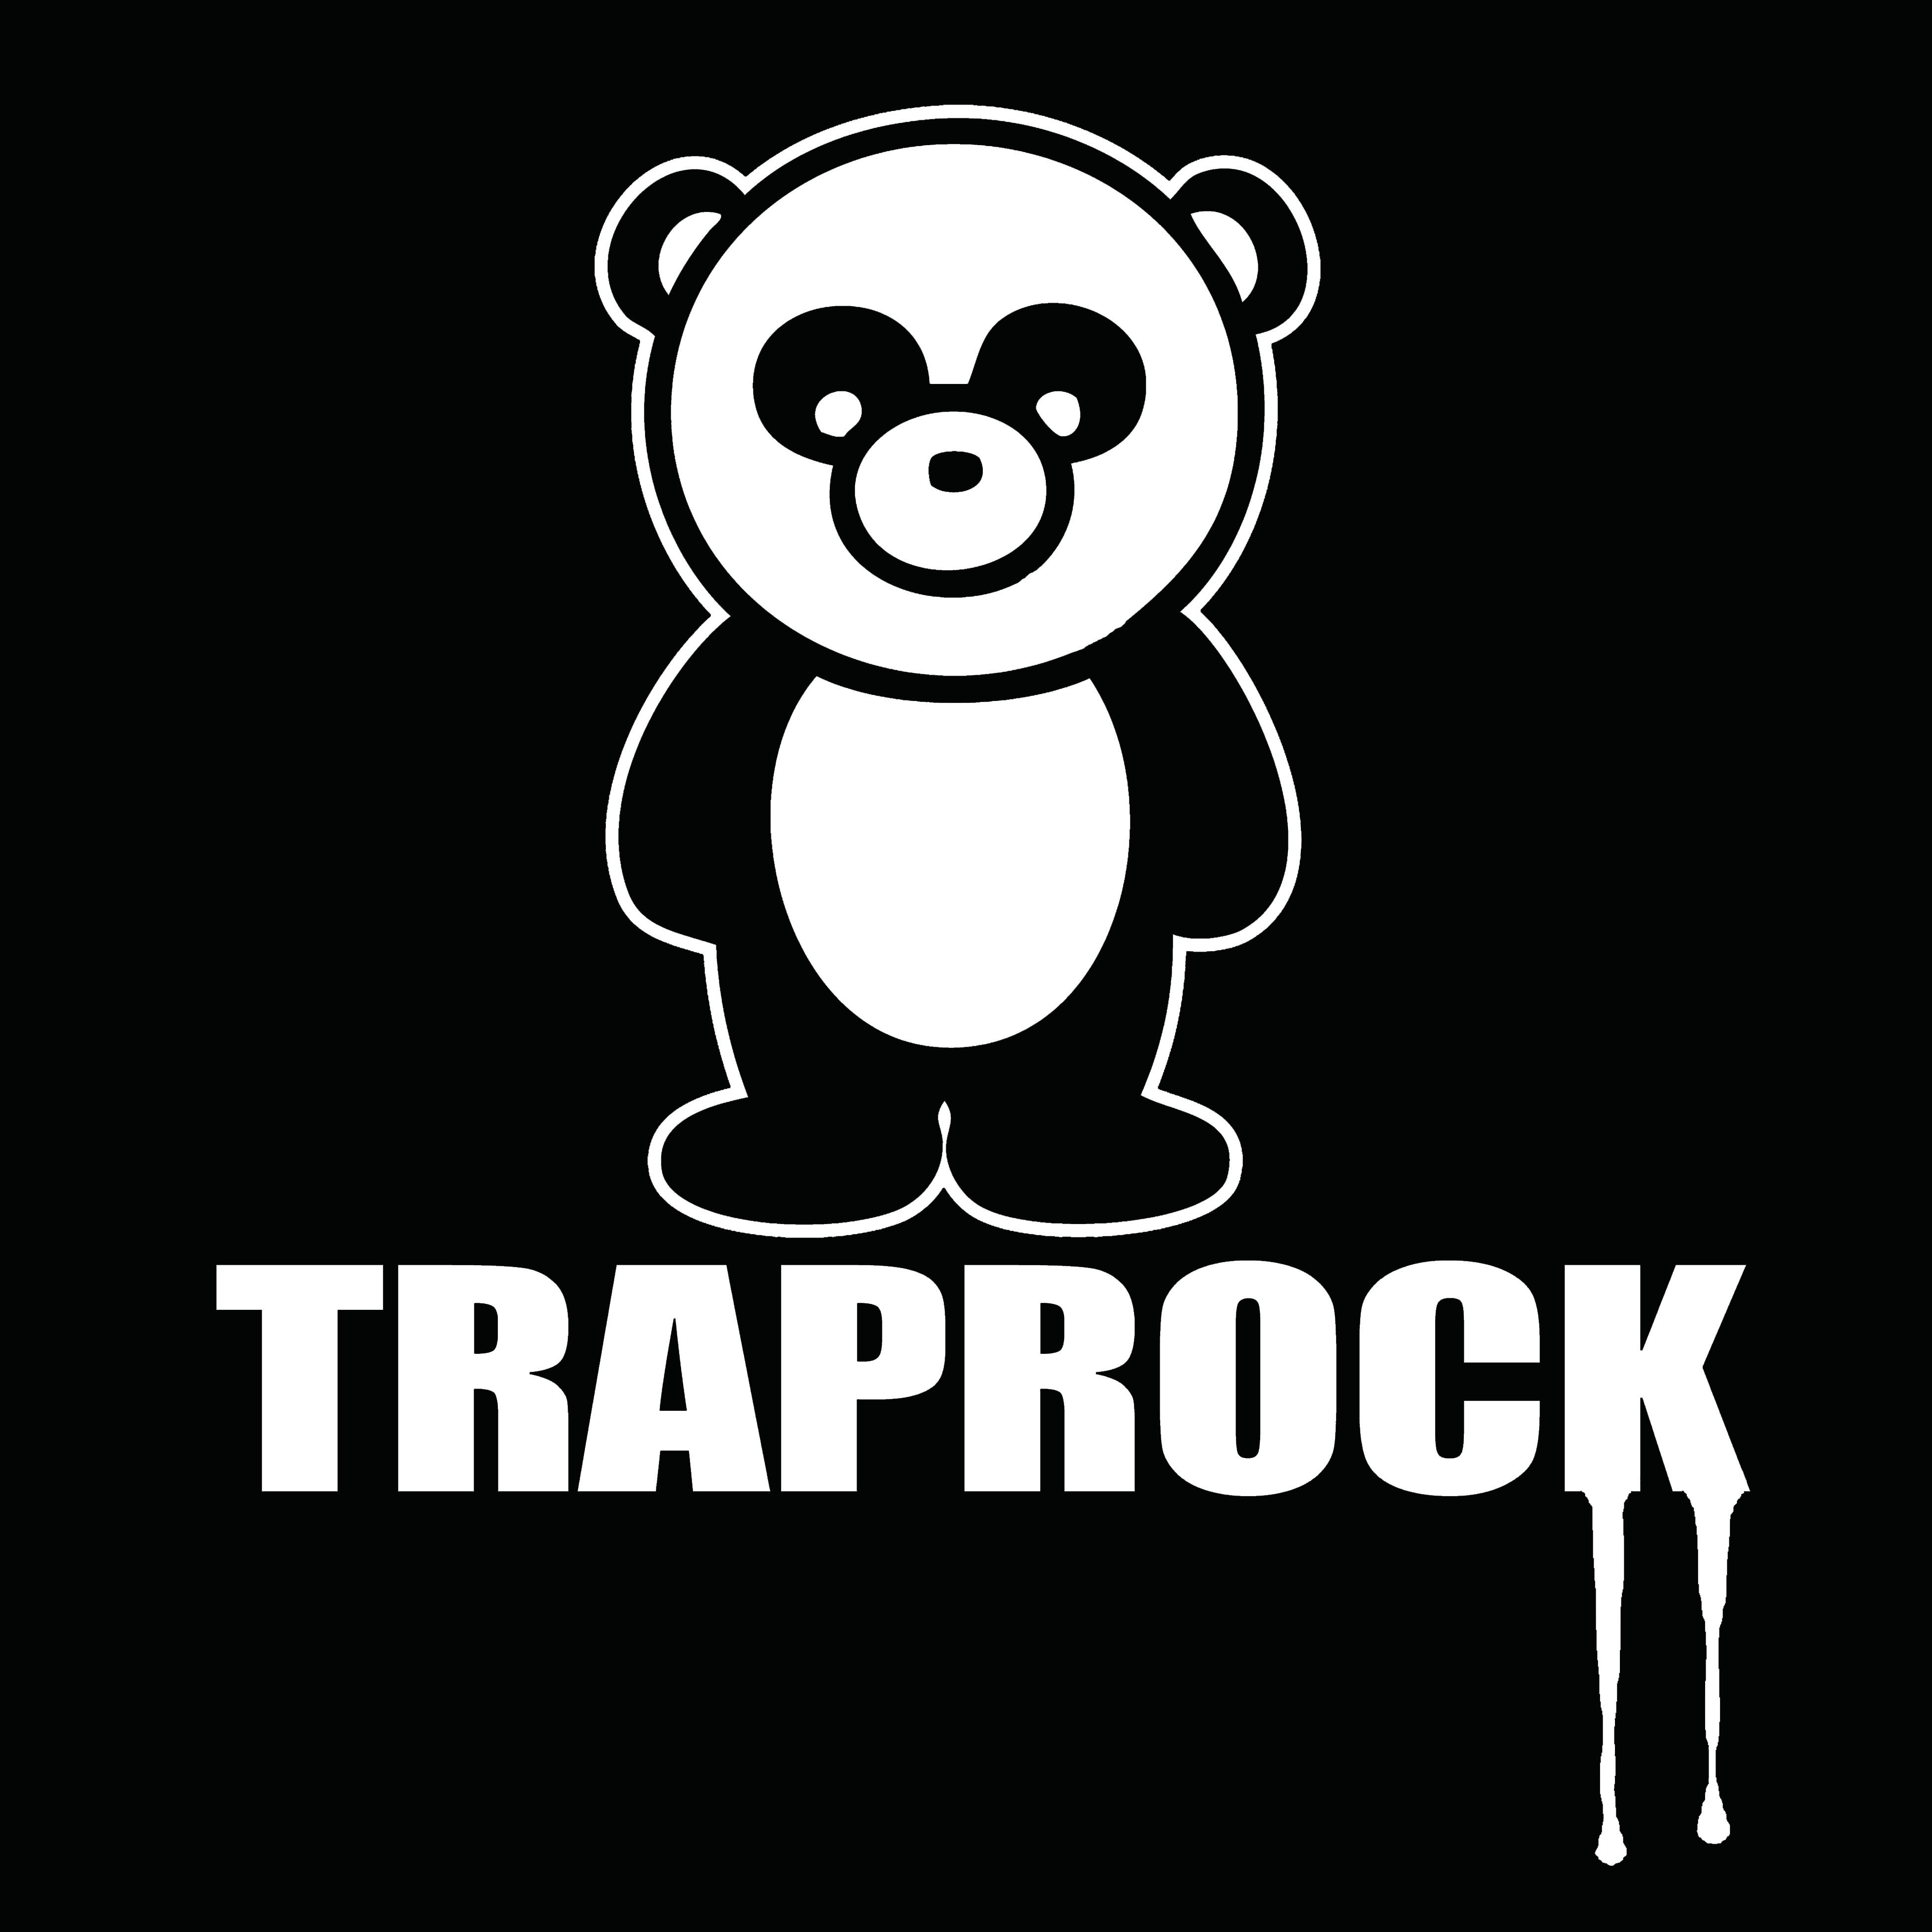 PandaTraprockBear vectored Final full lo